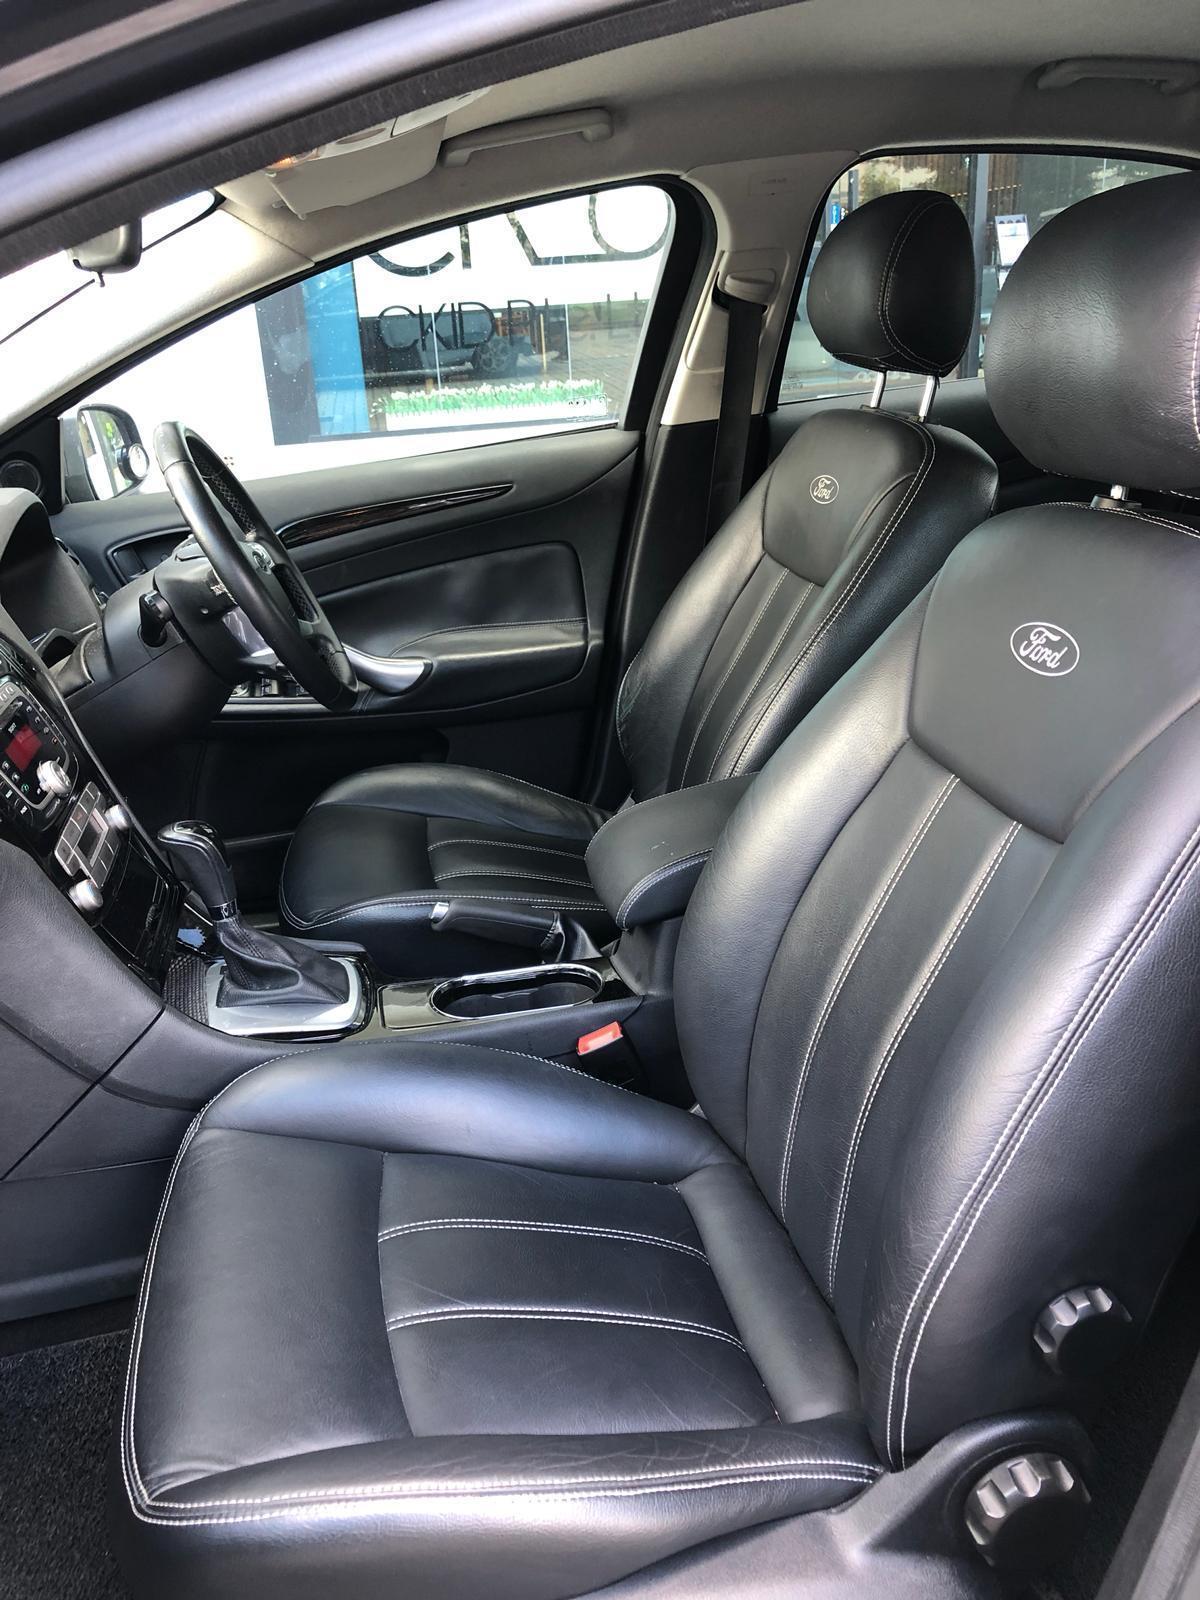 Ford Mondeo 2.3 Grab Gojek Ryde Tada & Non PHV Car Rental in Singapore!